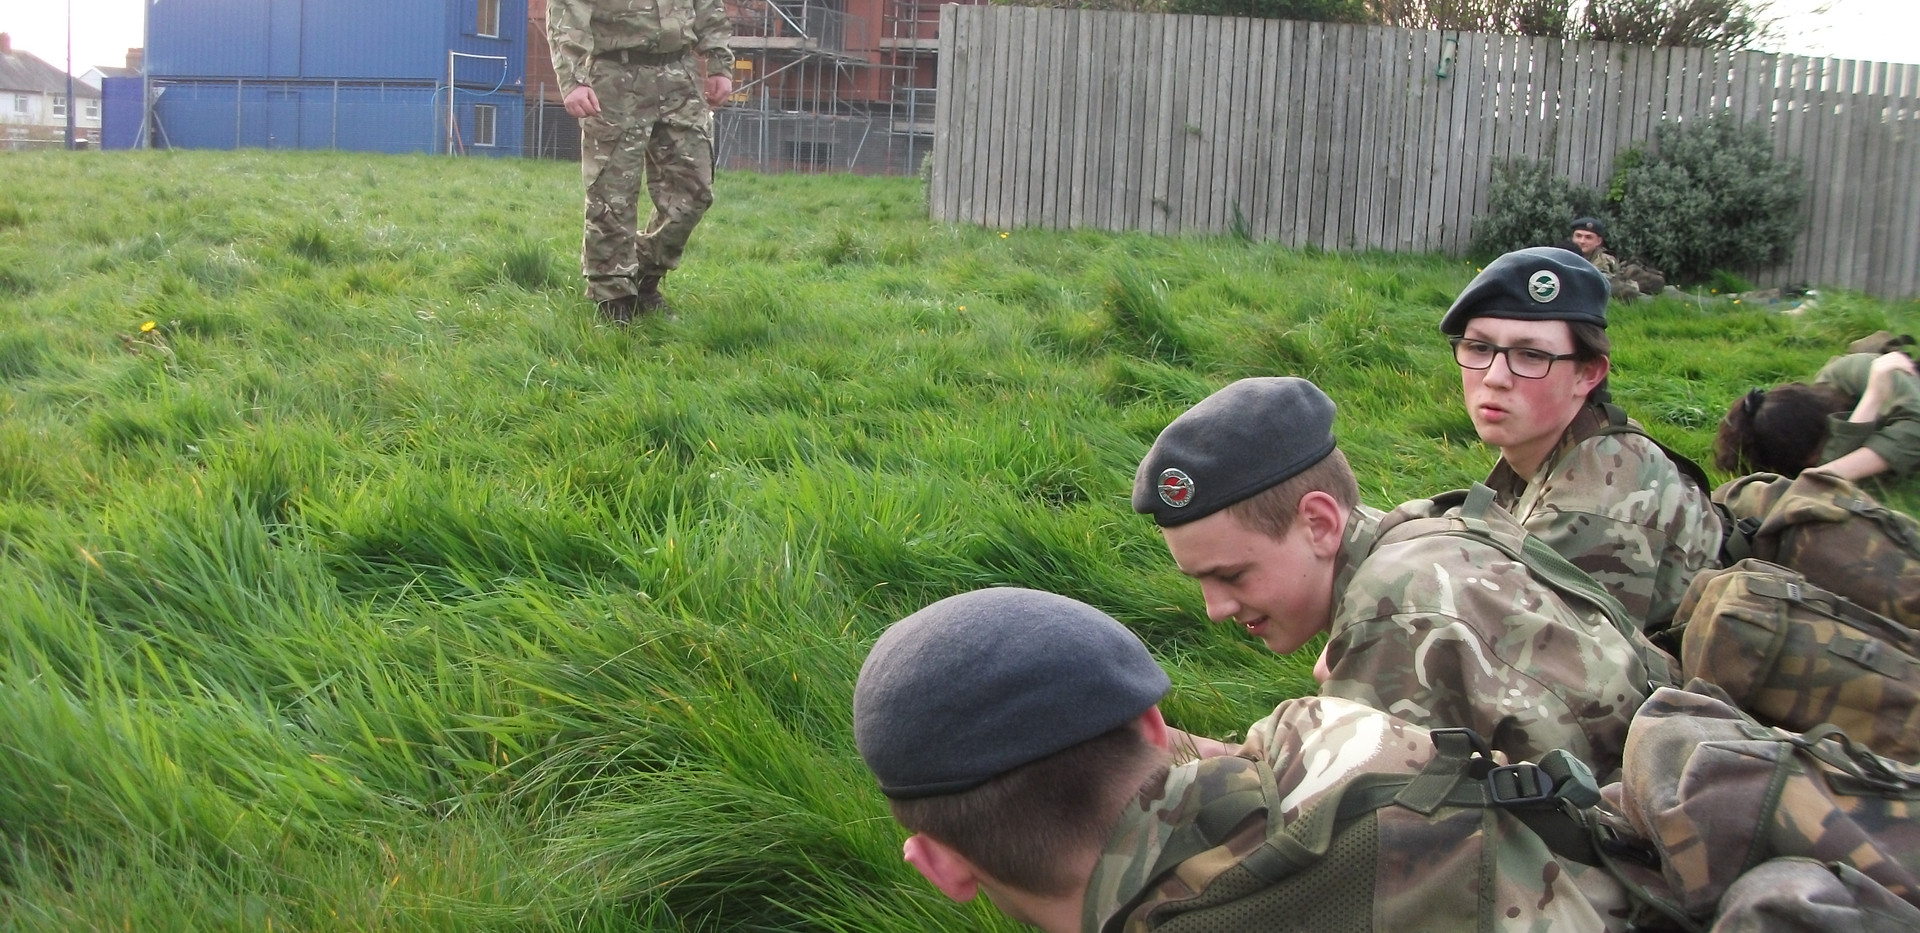 CWO Evans fieldcraft lesson